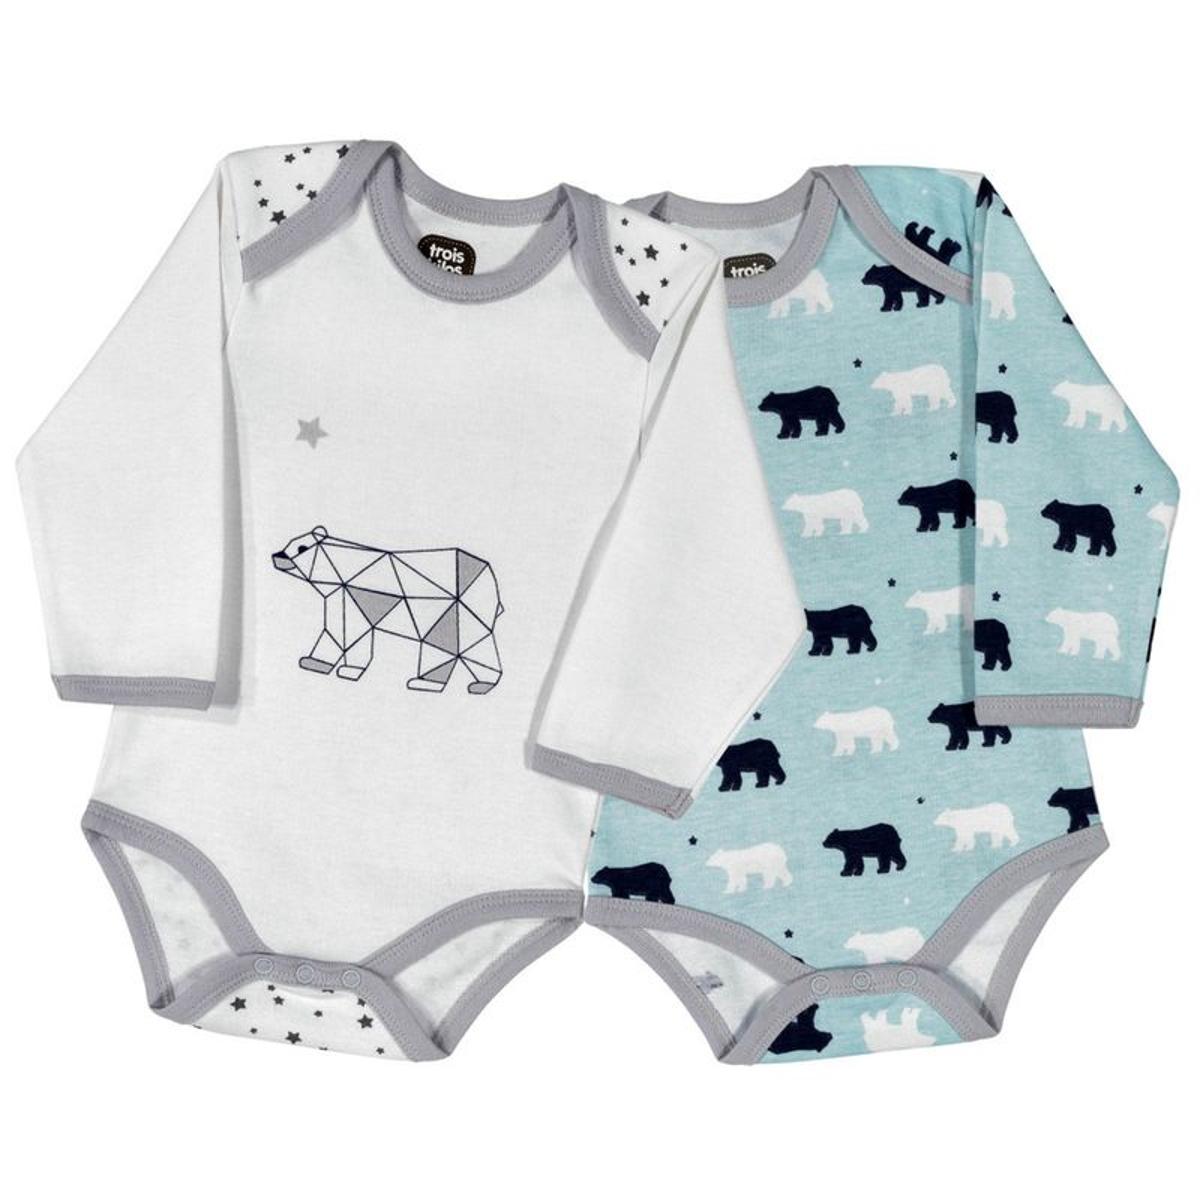 Body bébé garçon - Blanc et bleu ours origami